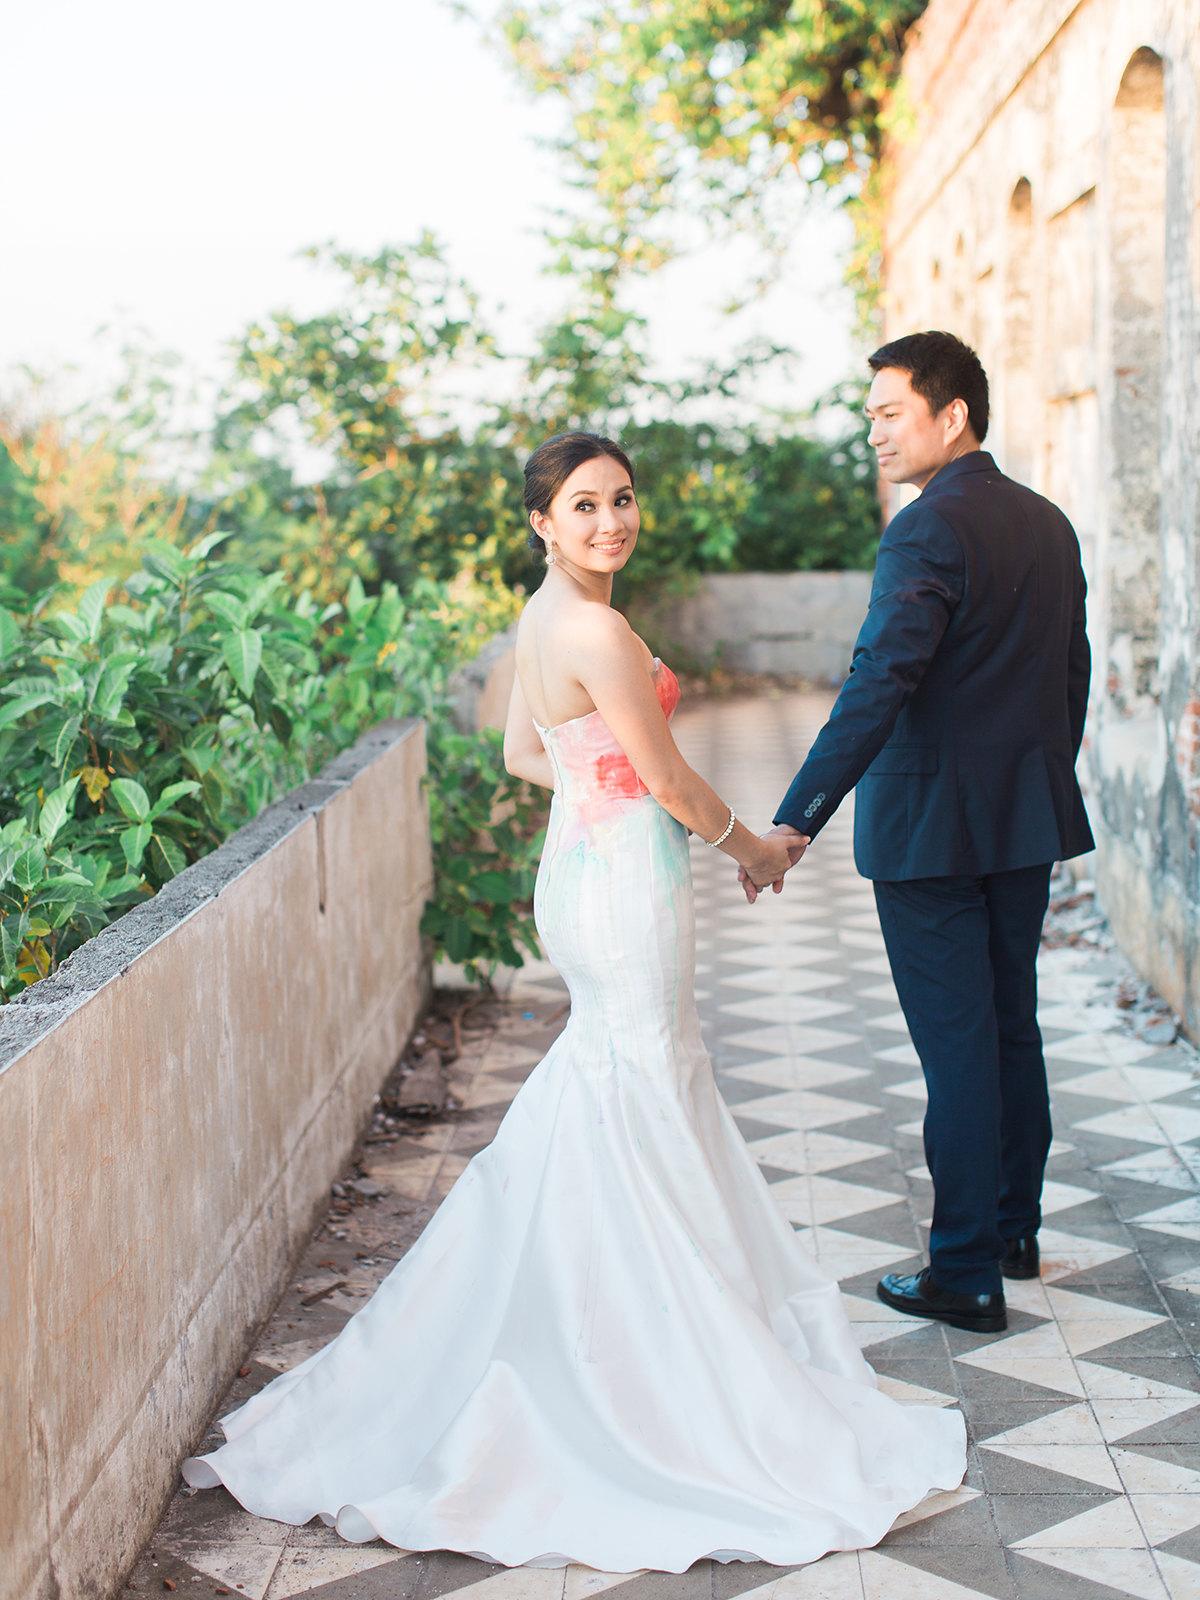 philippine wedding photographer manila 27